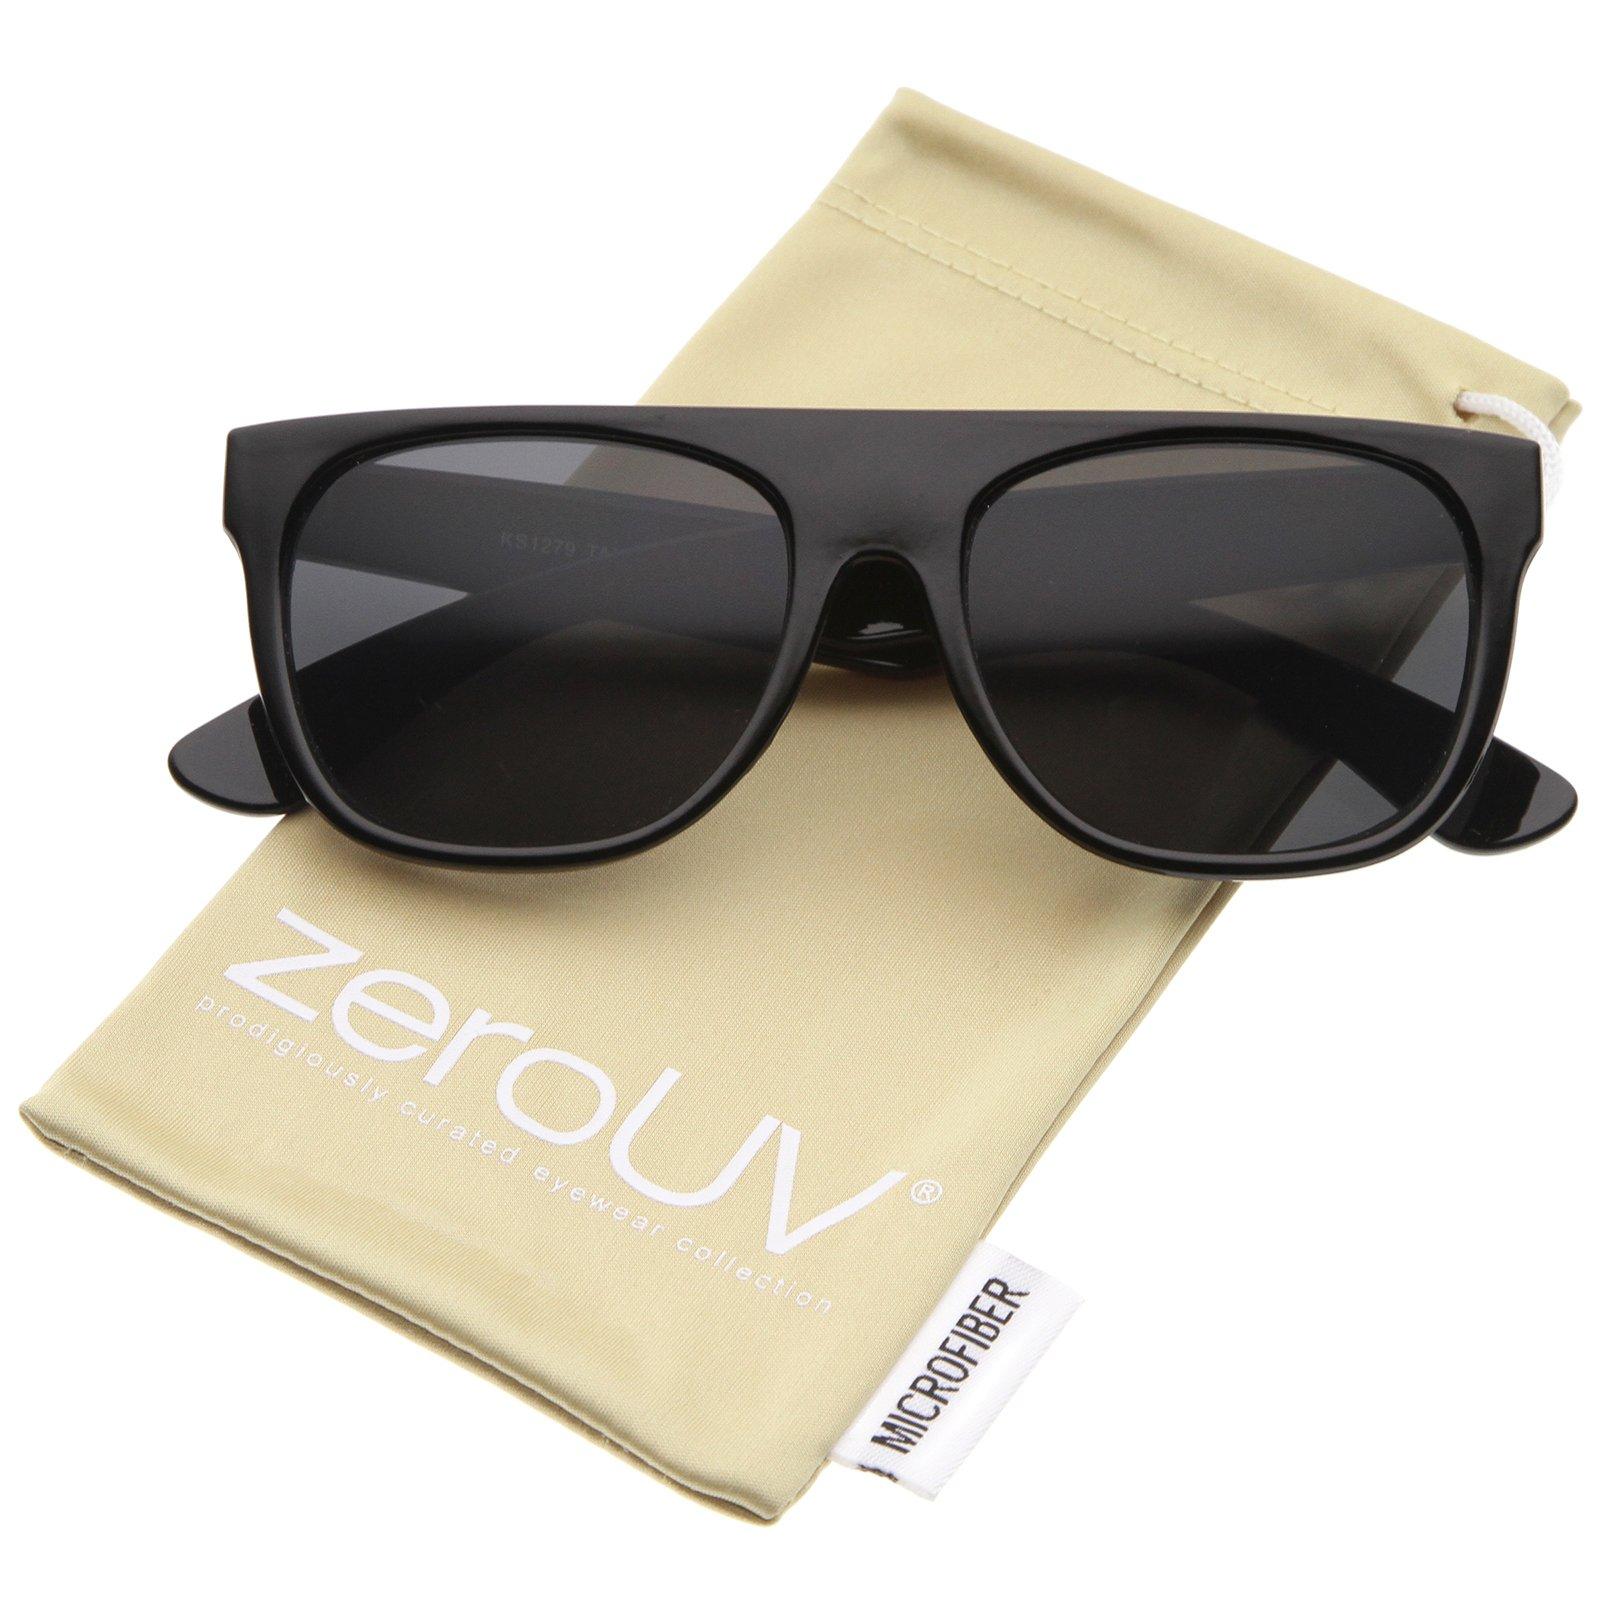 Modern Super Flat-Top Wide Temple Horn Rimmed Sunglasses 55mm (Shiny Black/Smoke)